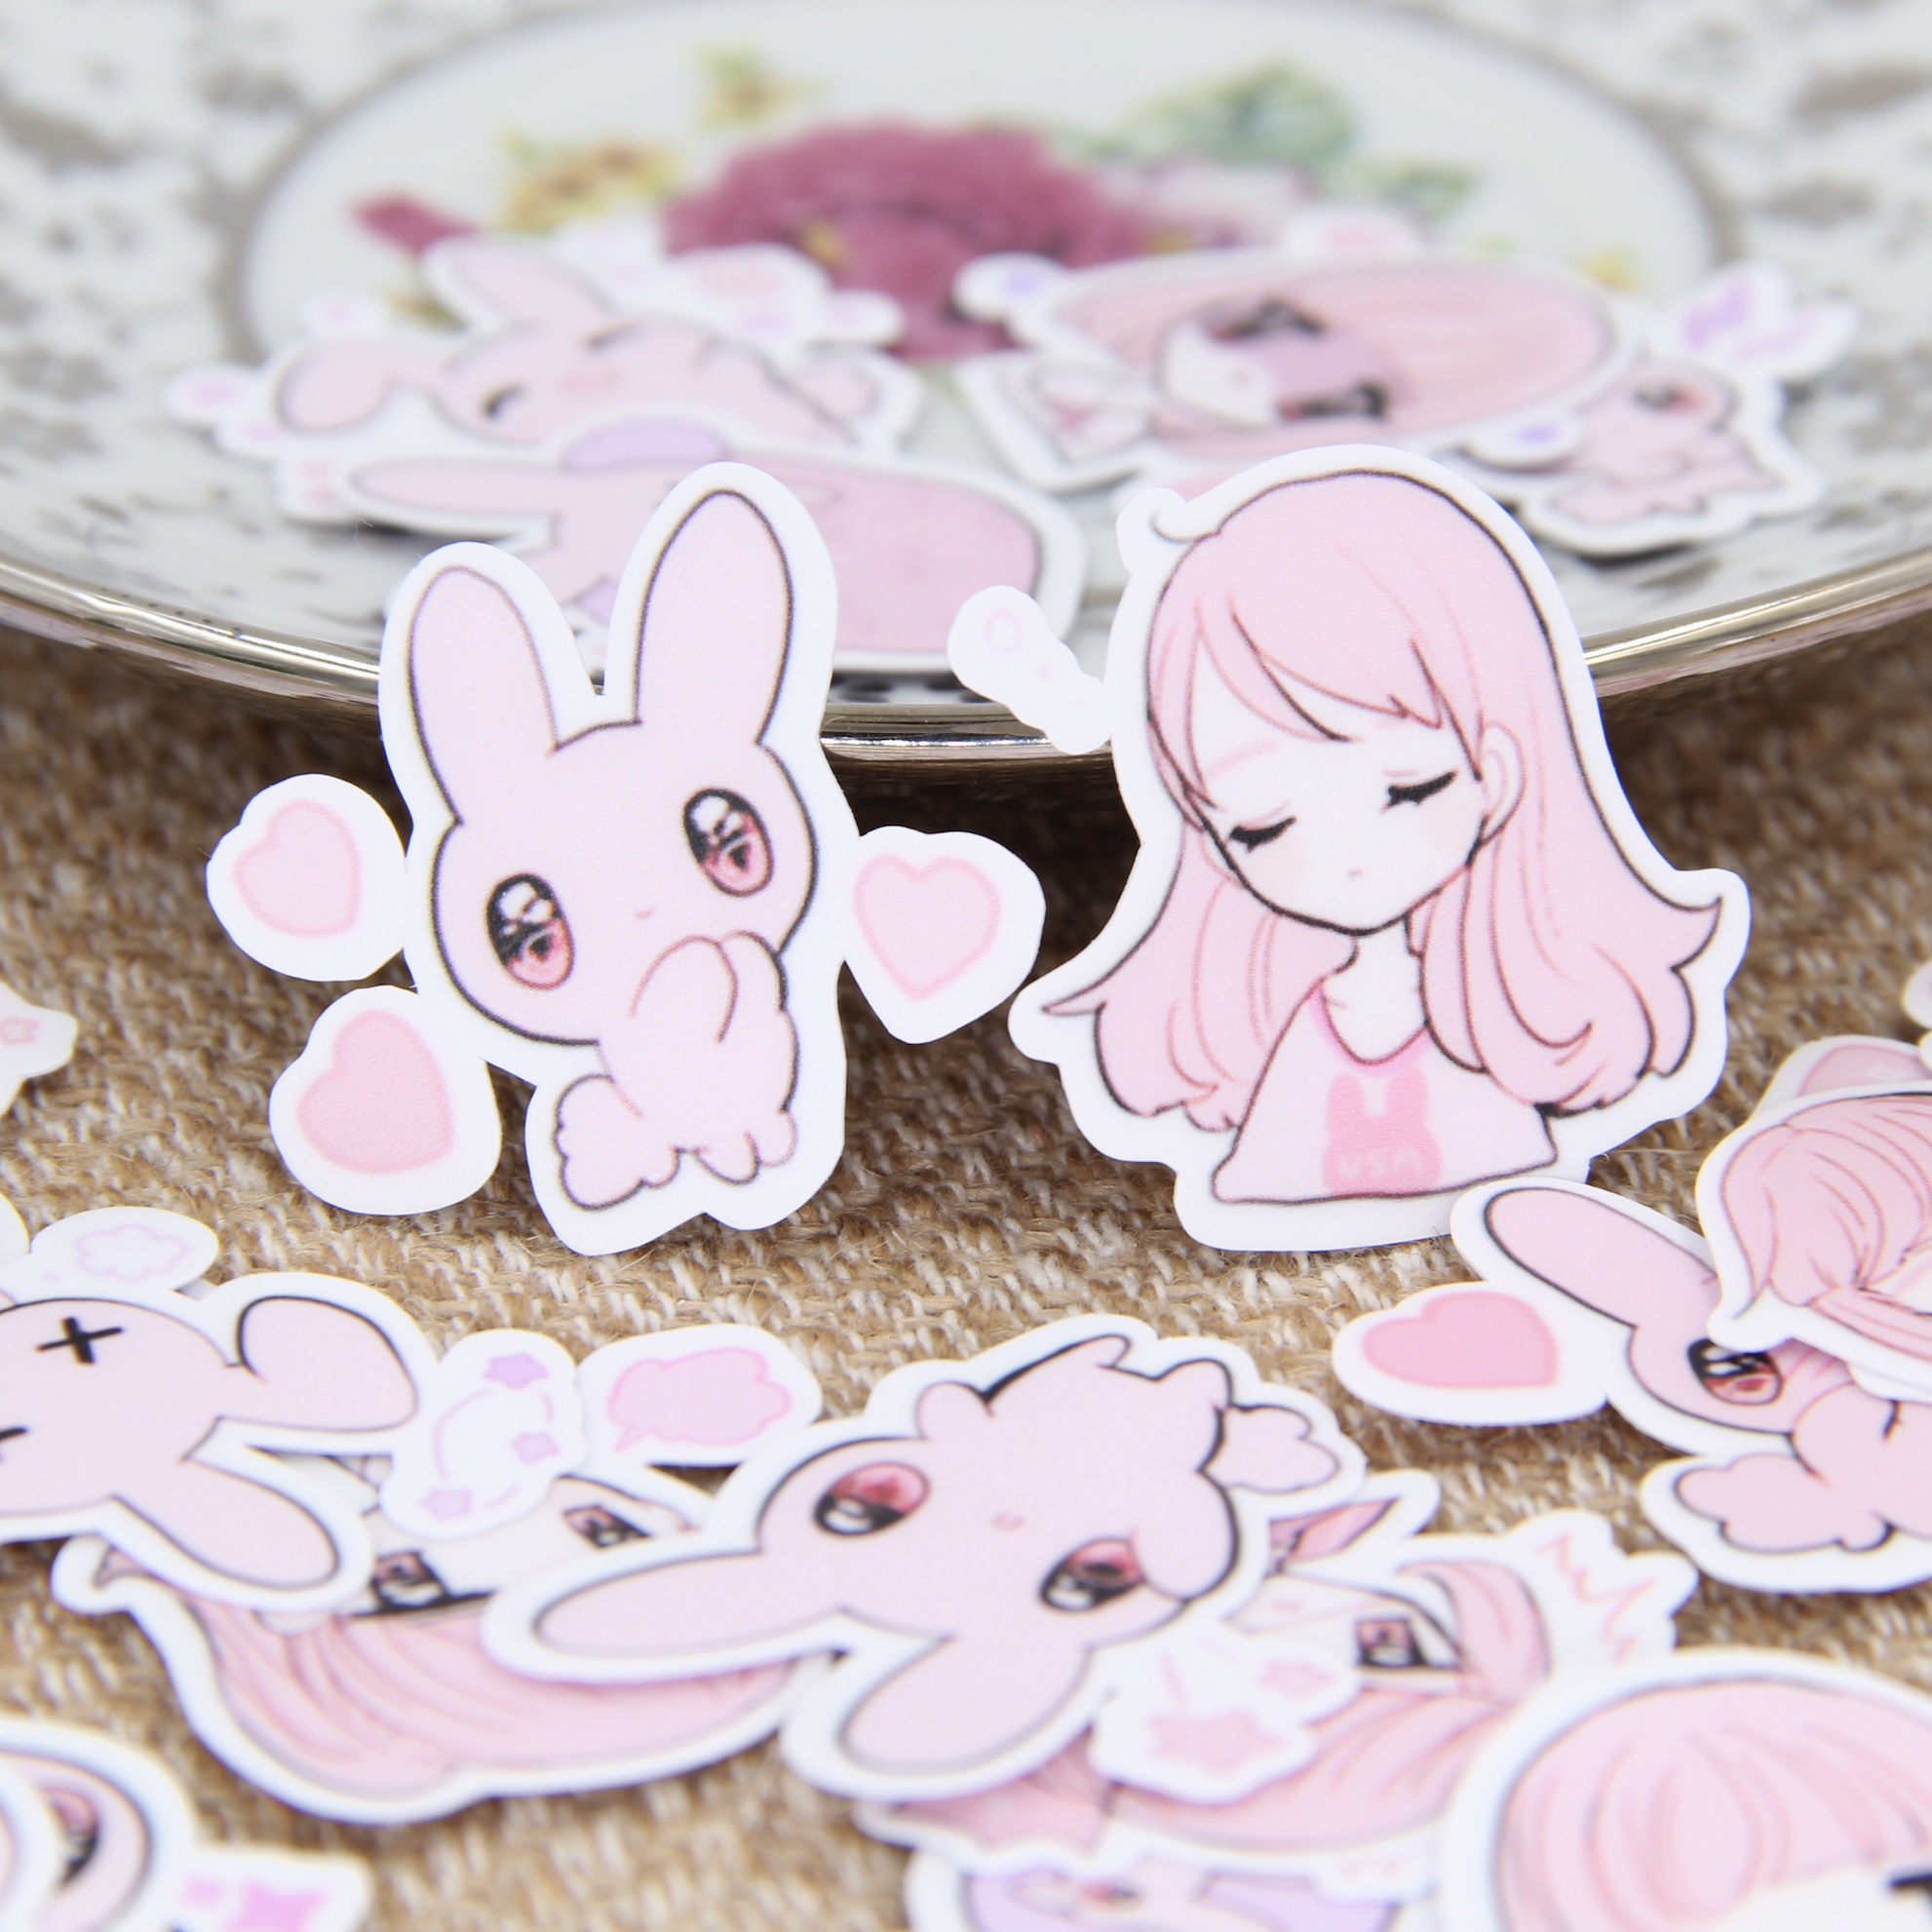 40pcs Cut Pink Girl Rabbit Bunny Girls Cartoon Scrapbooking Stickers DIY Craft Decrative Sticker Pack Albums Deco Diary Deco